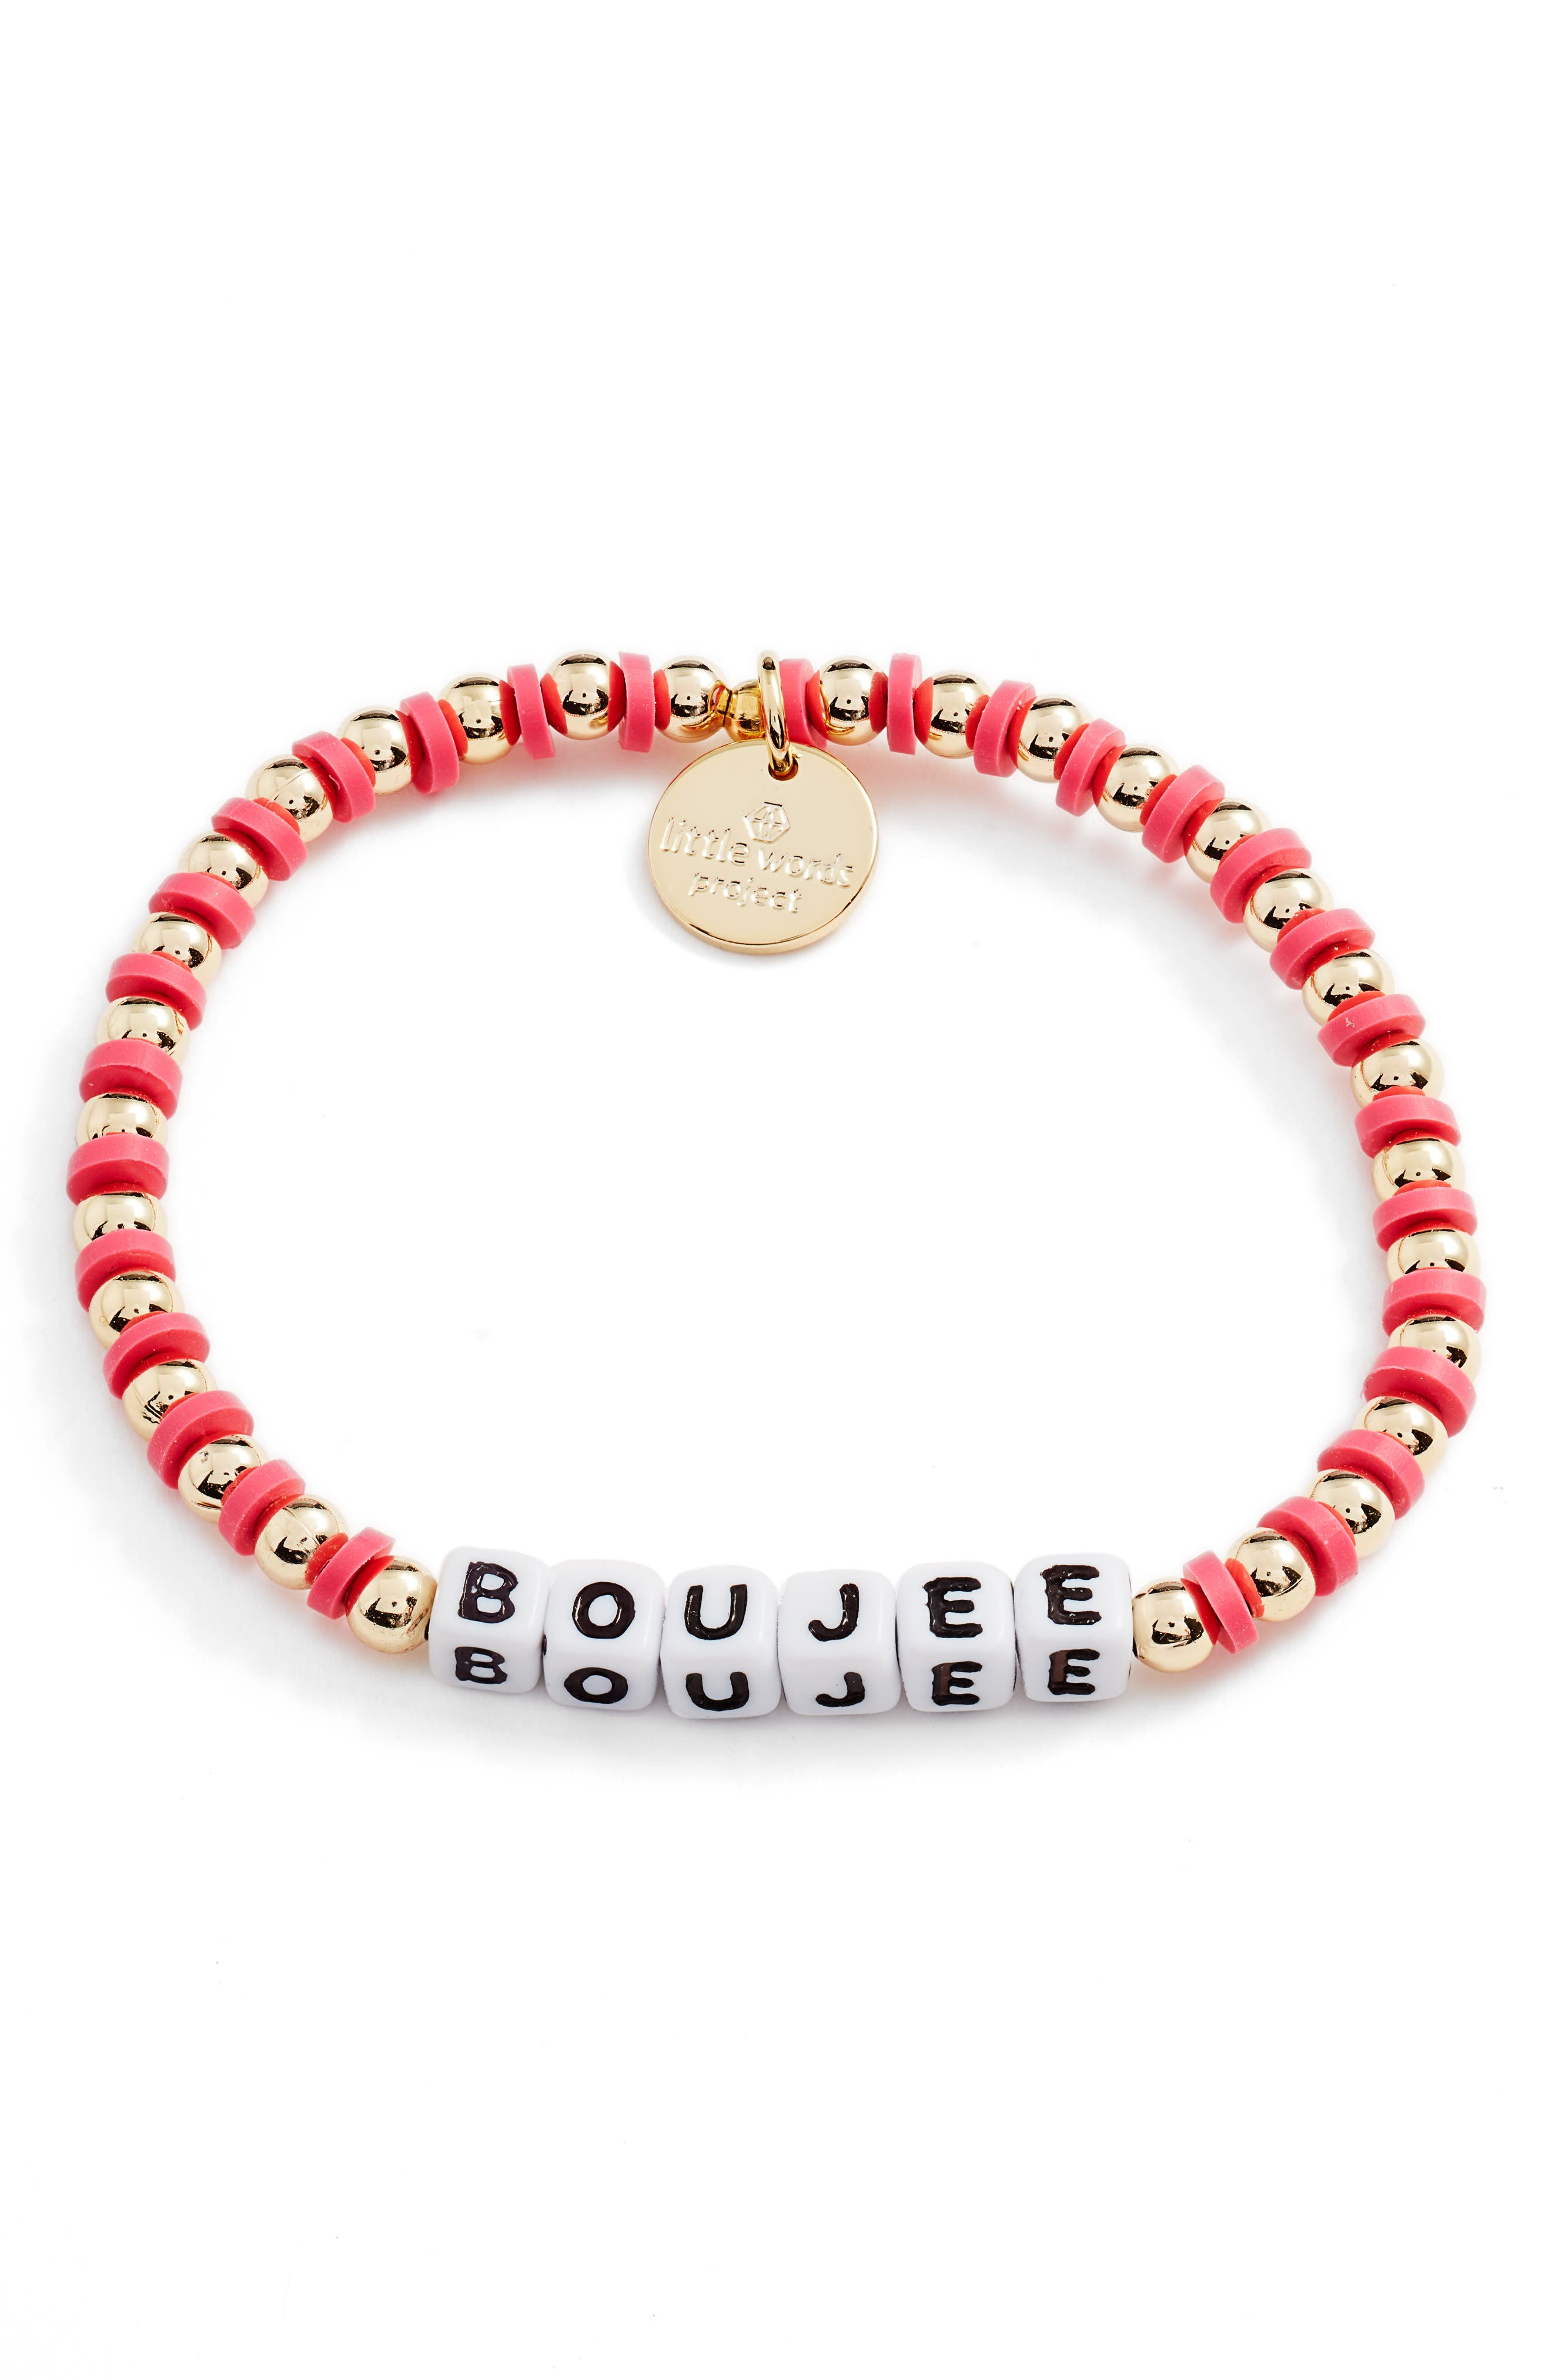 Boujee Stretch Bracelet